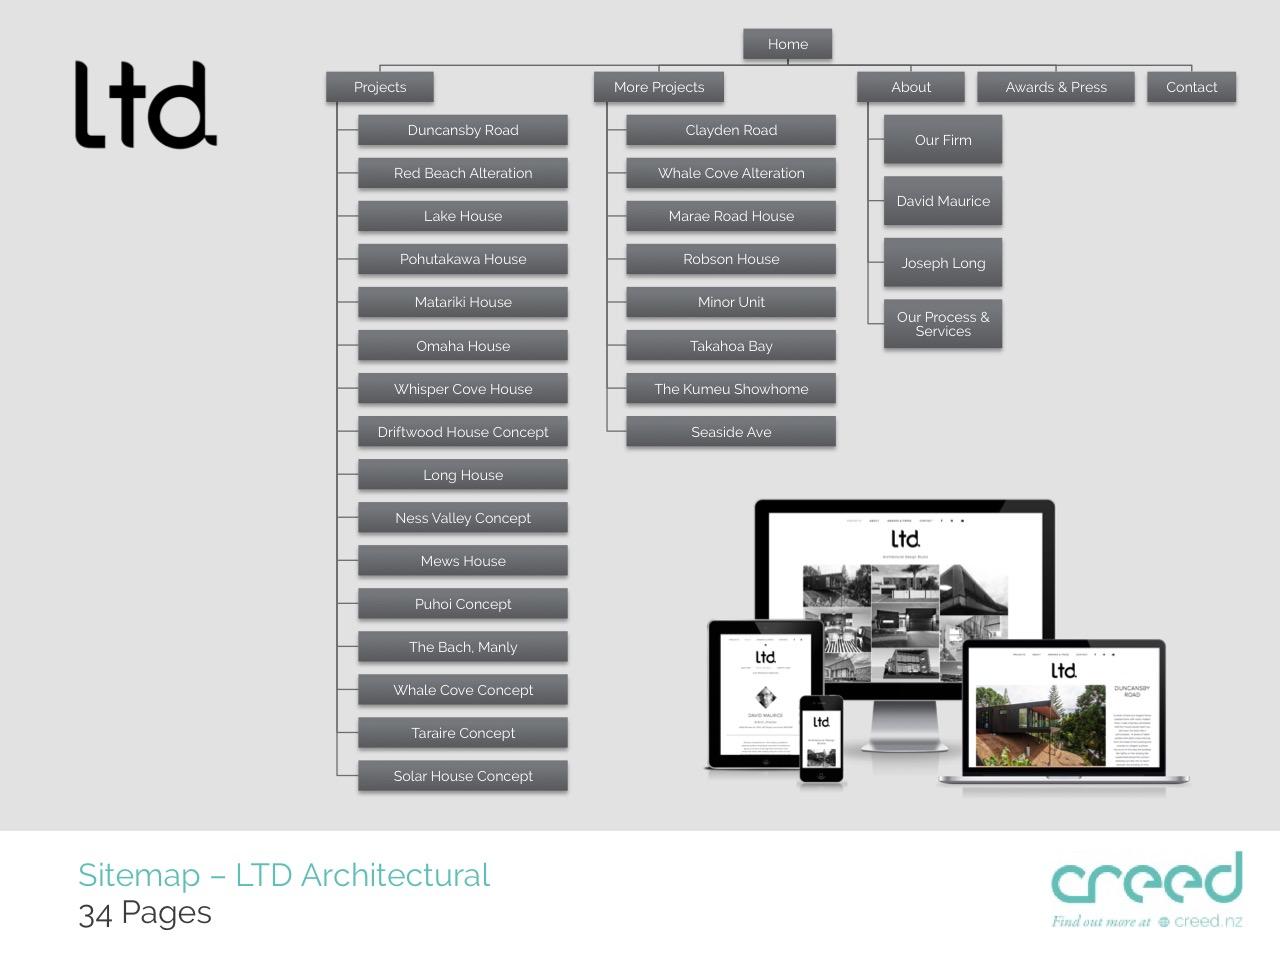 LTD Architectural